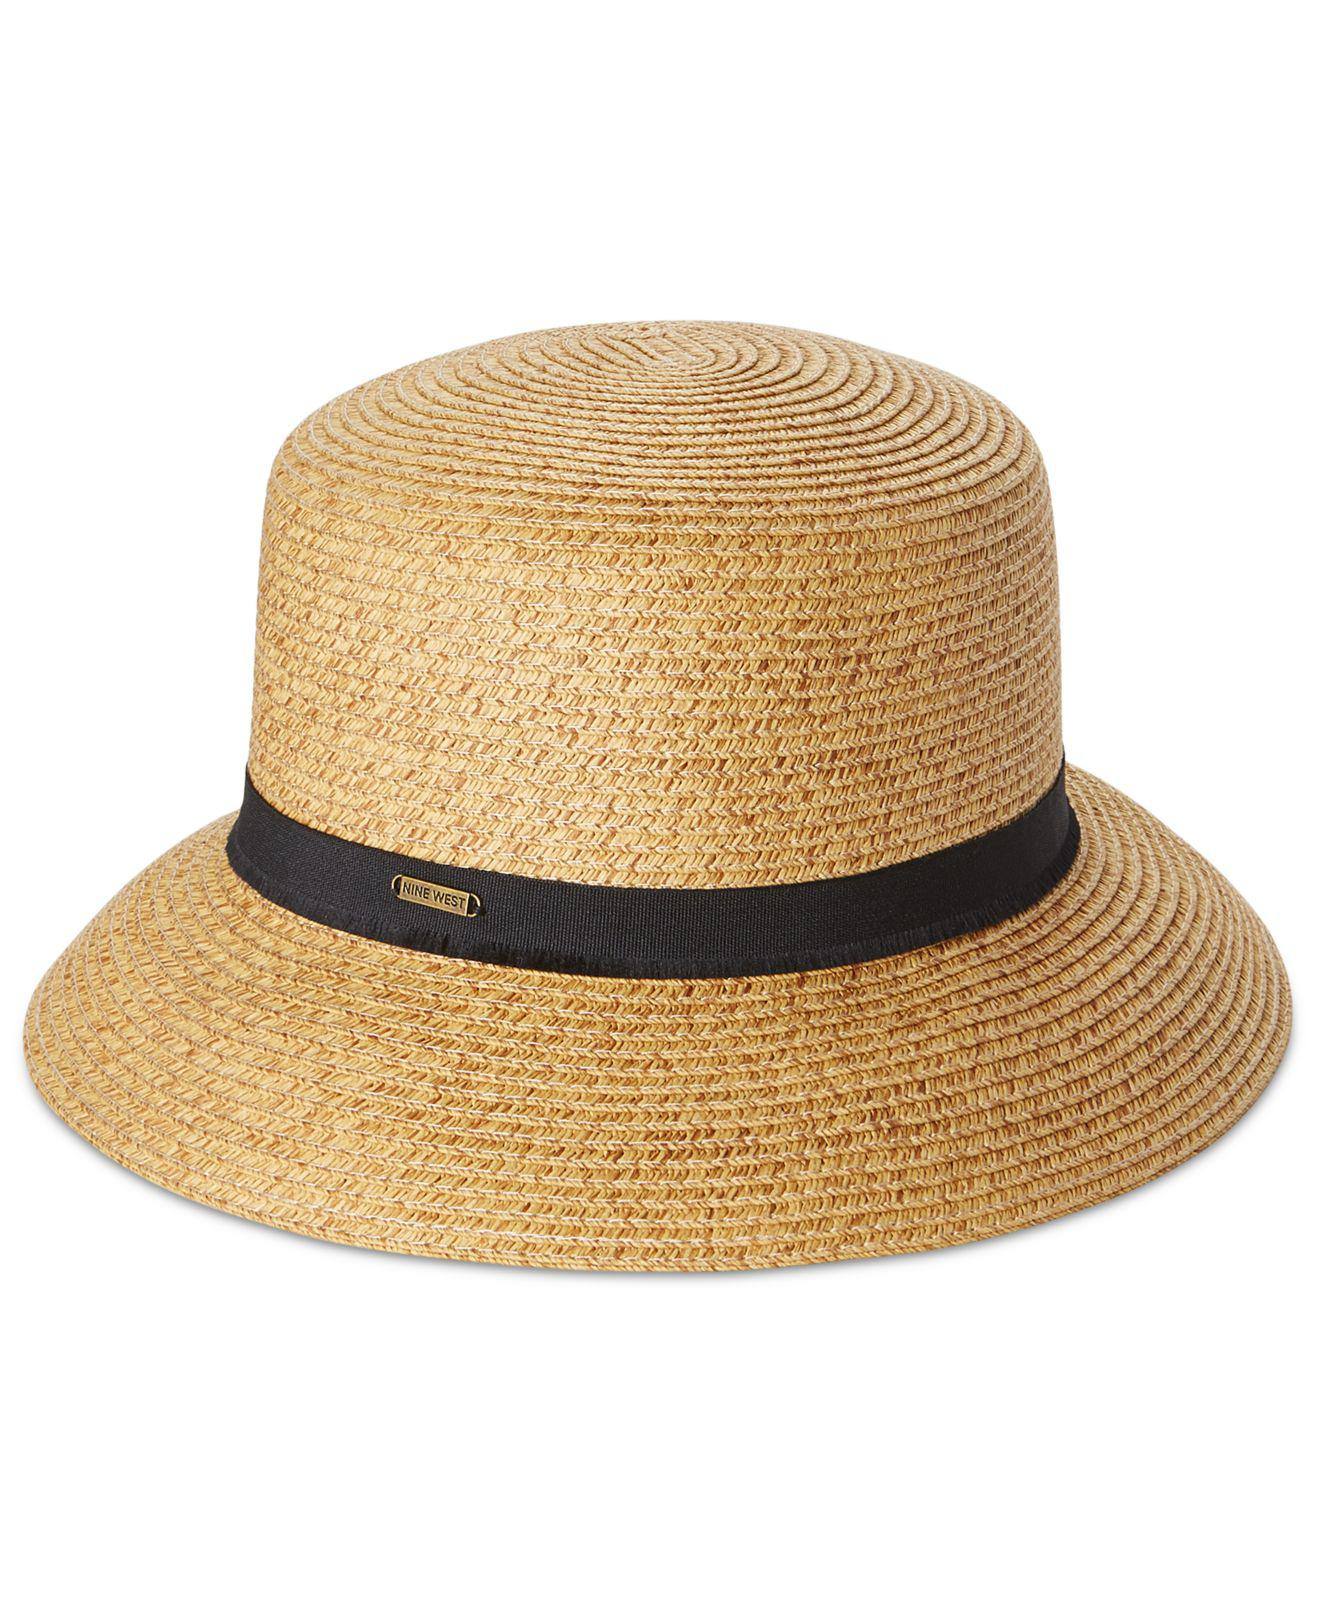 e471f30c7f9b82 Nine West Packable Microbrim Hat - Lyst